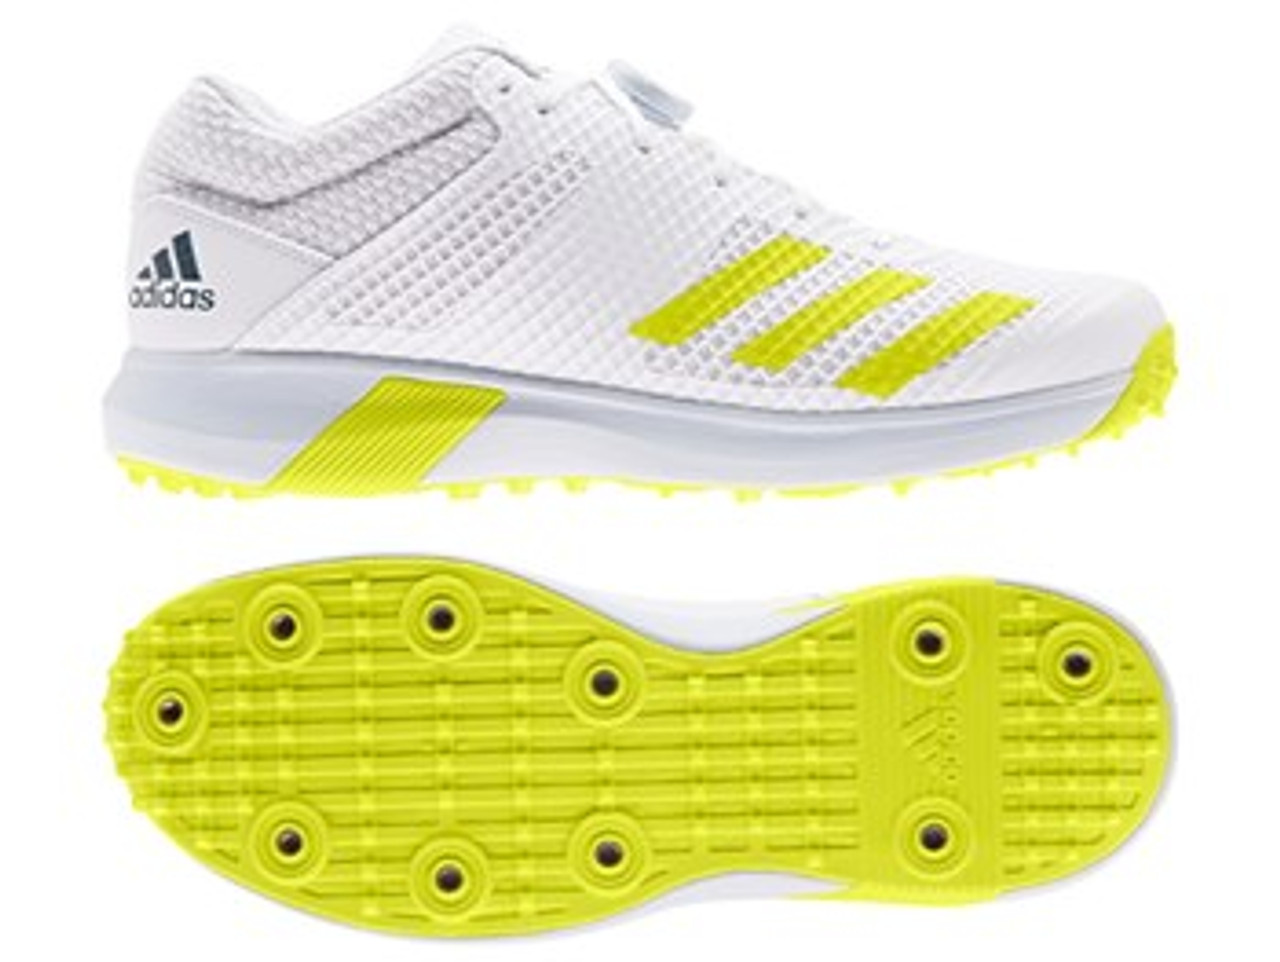 Adidas Adipower Vector MID 20 Cricket Shoes 2021